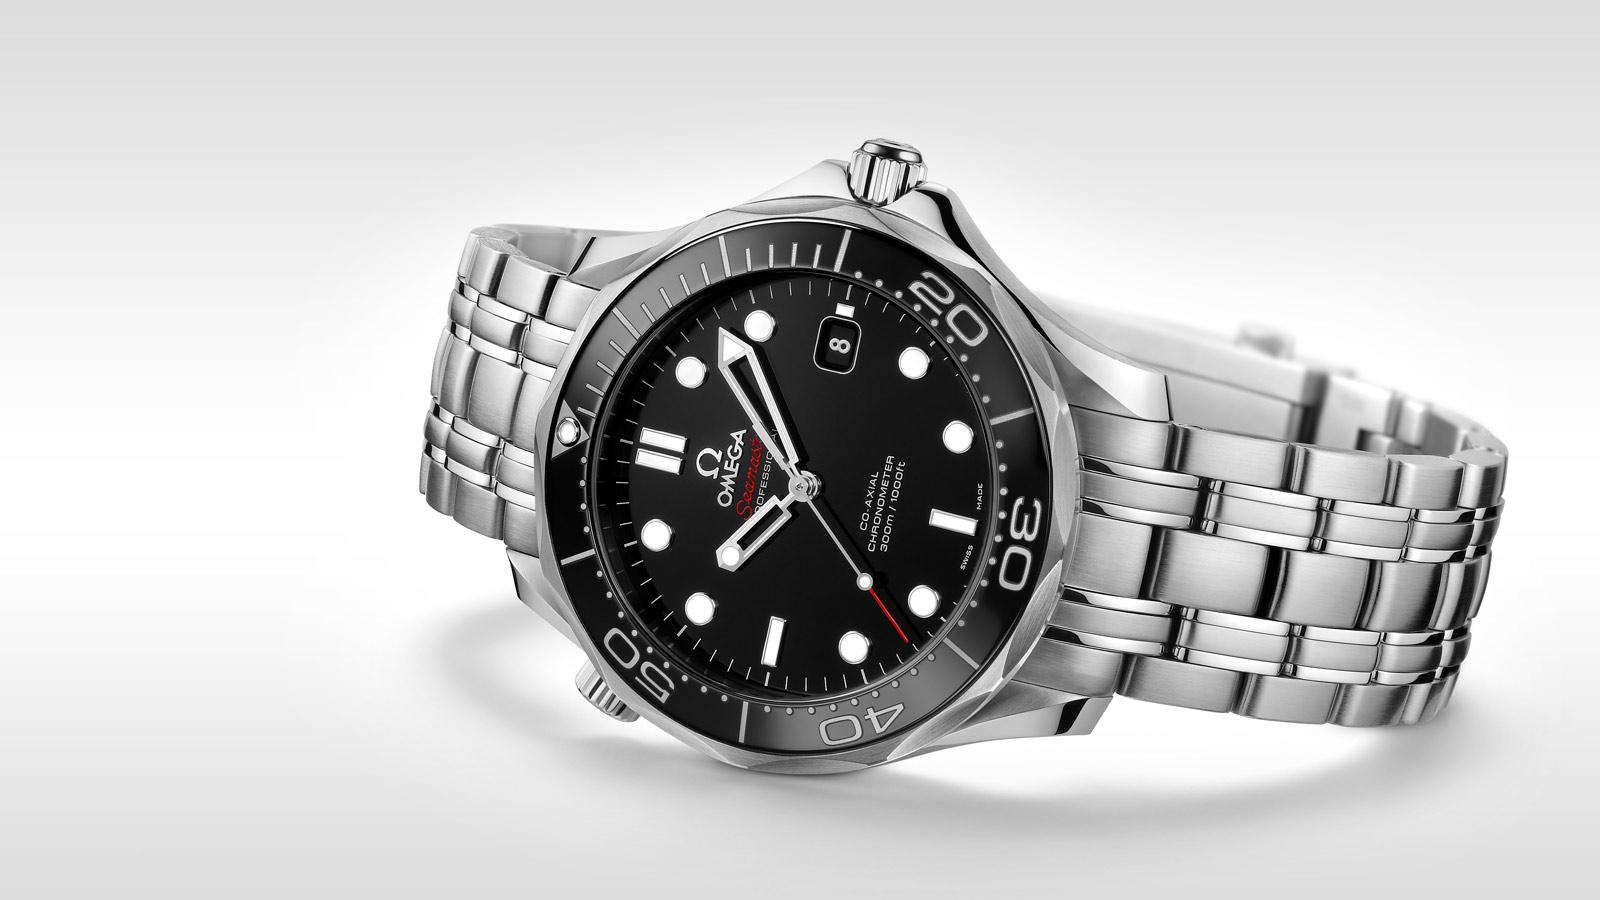 Seamaster 300米潜水表 300米潜水表 41毫米同轴腕表 - 212.30.41.20.01.003 - 查看 1